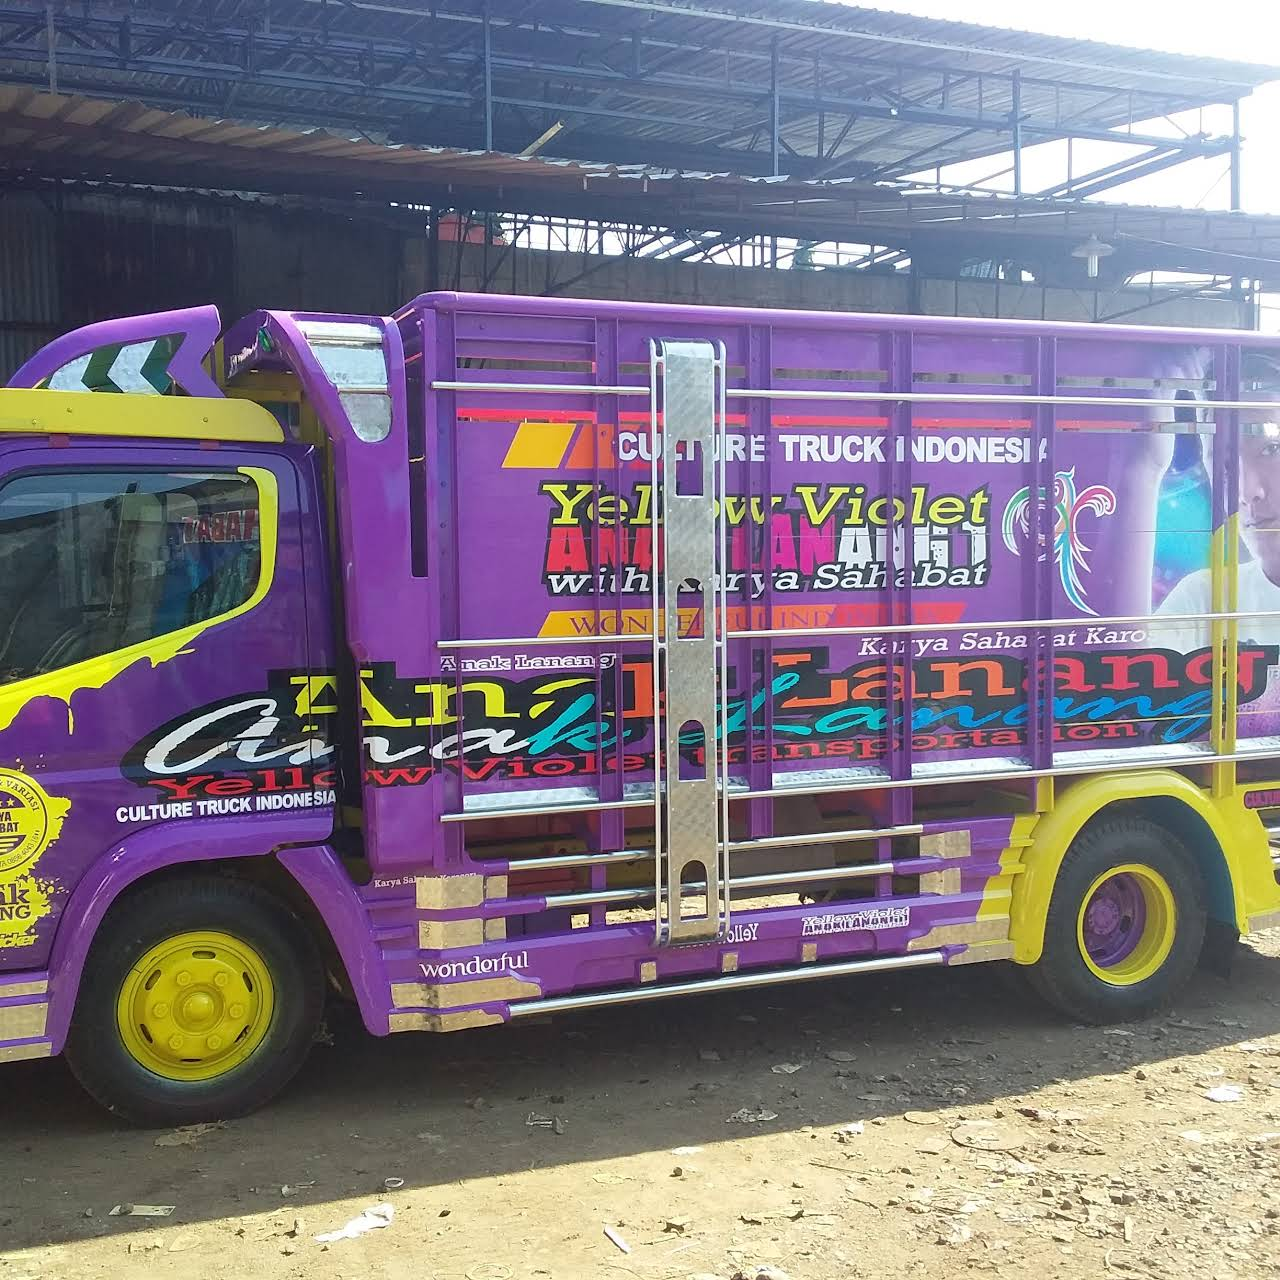 Cv Karya Sahabat Karoseri Bak Truk Dan Variasi Bengkel Mobil